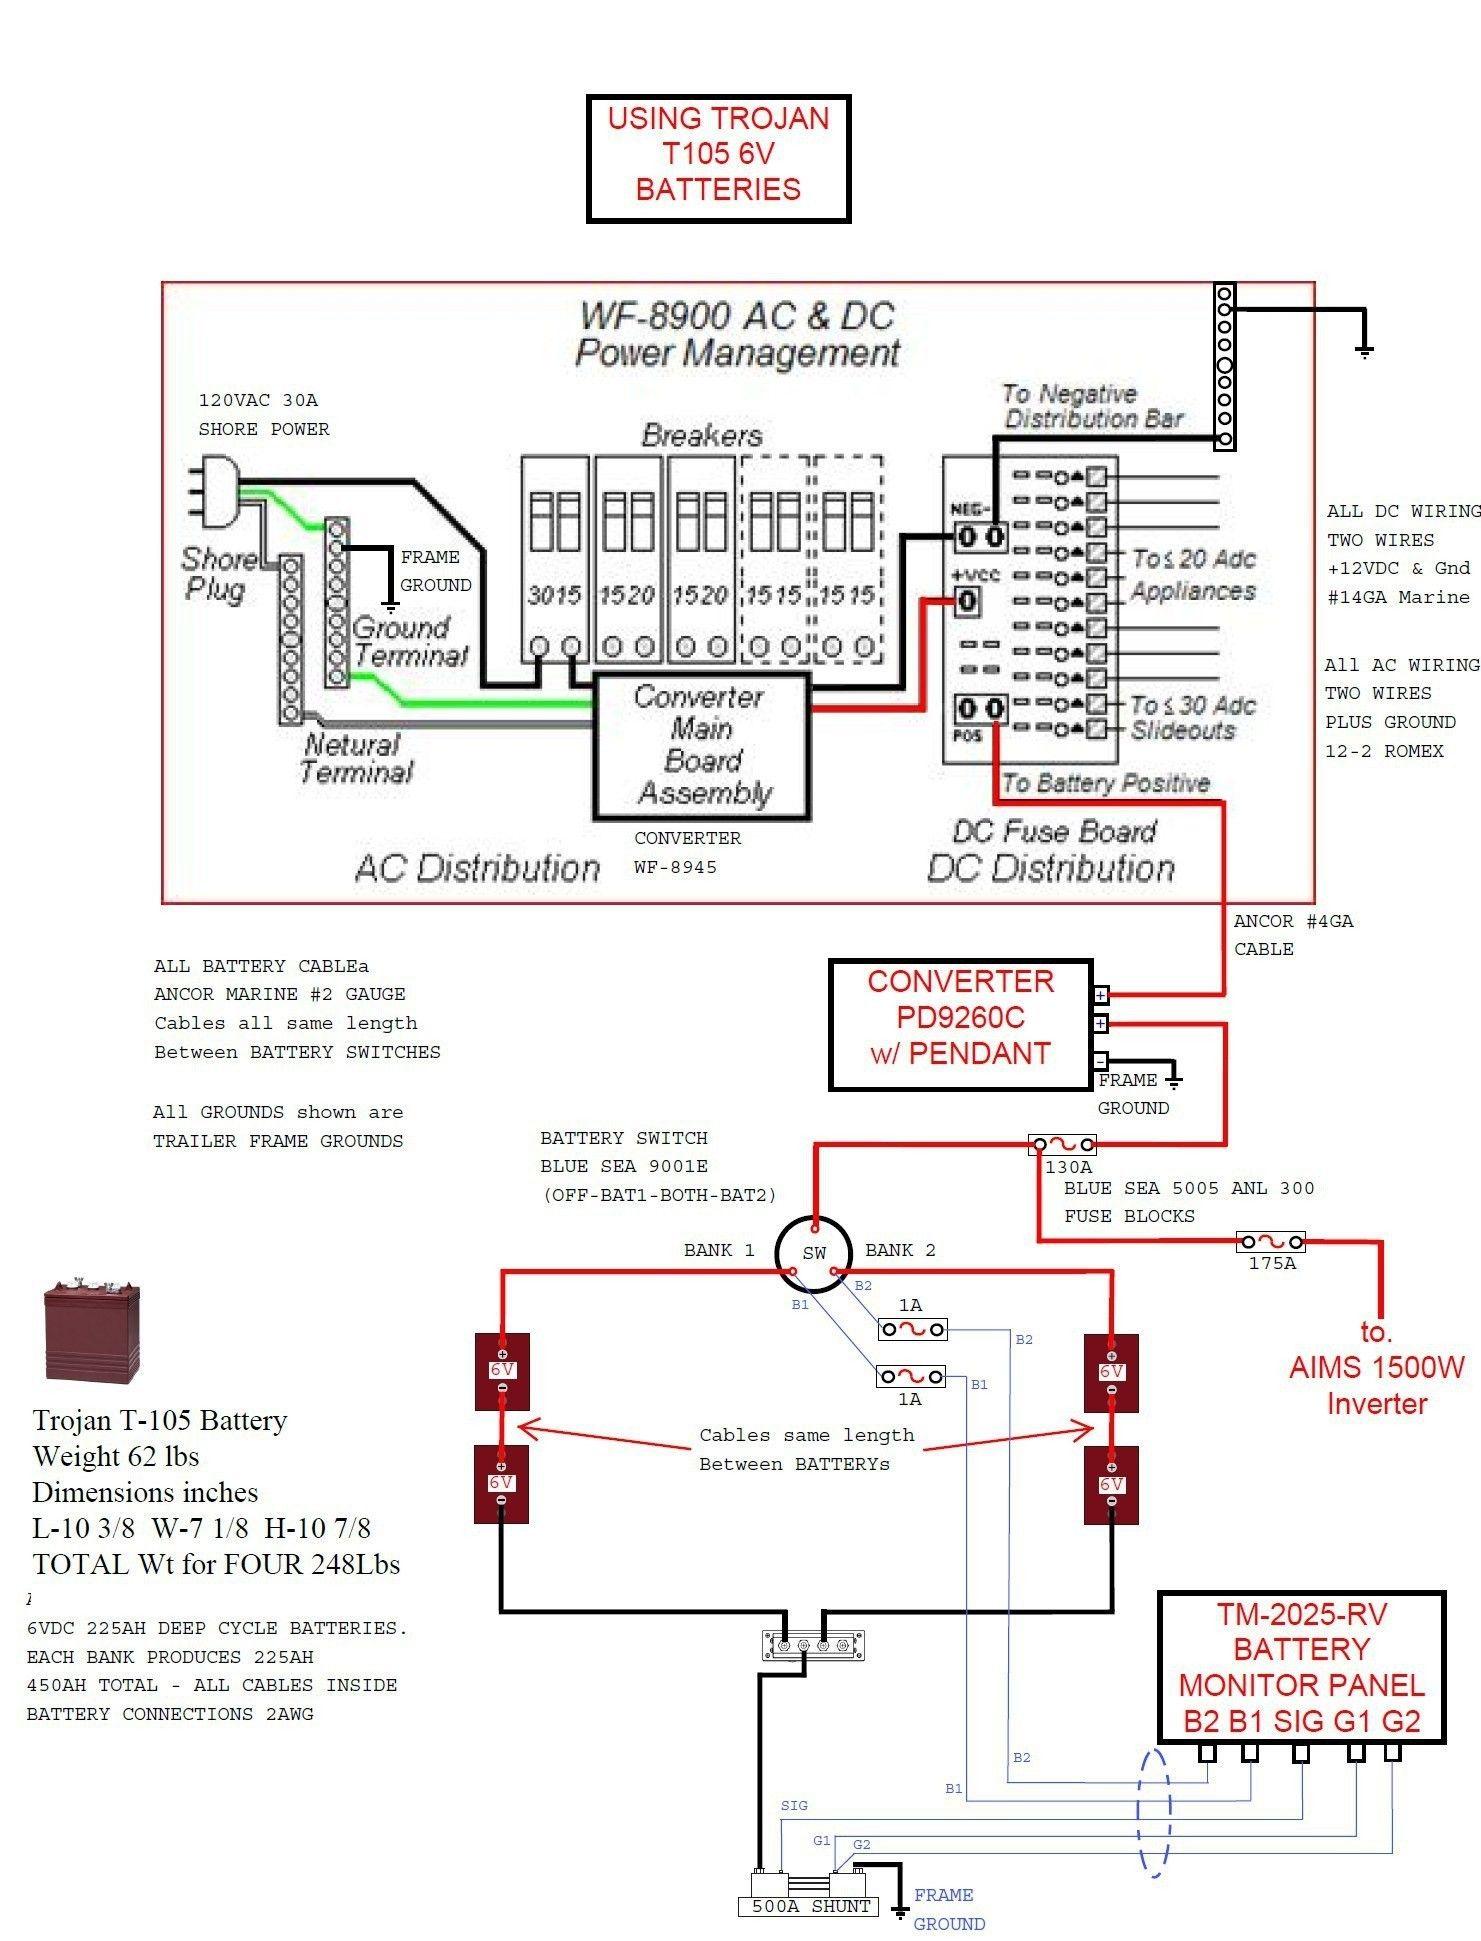 Kib Pcbm2 Wiring Diagram New In 2020 System Monitor Diagram Trailer Wiring Diagram